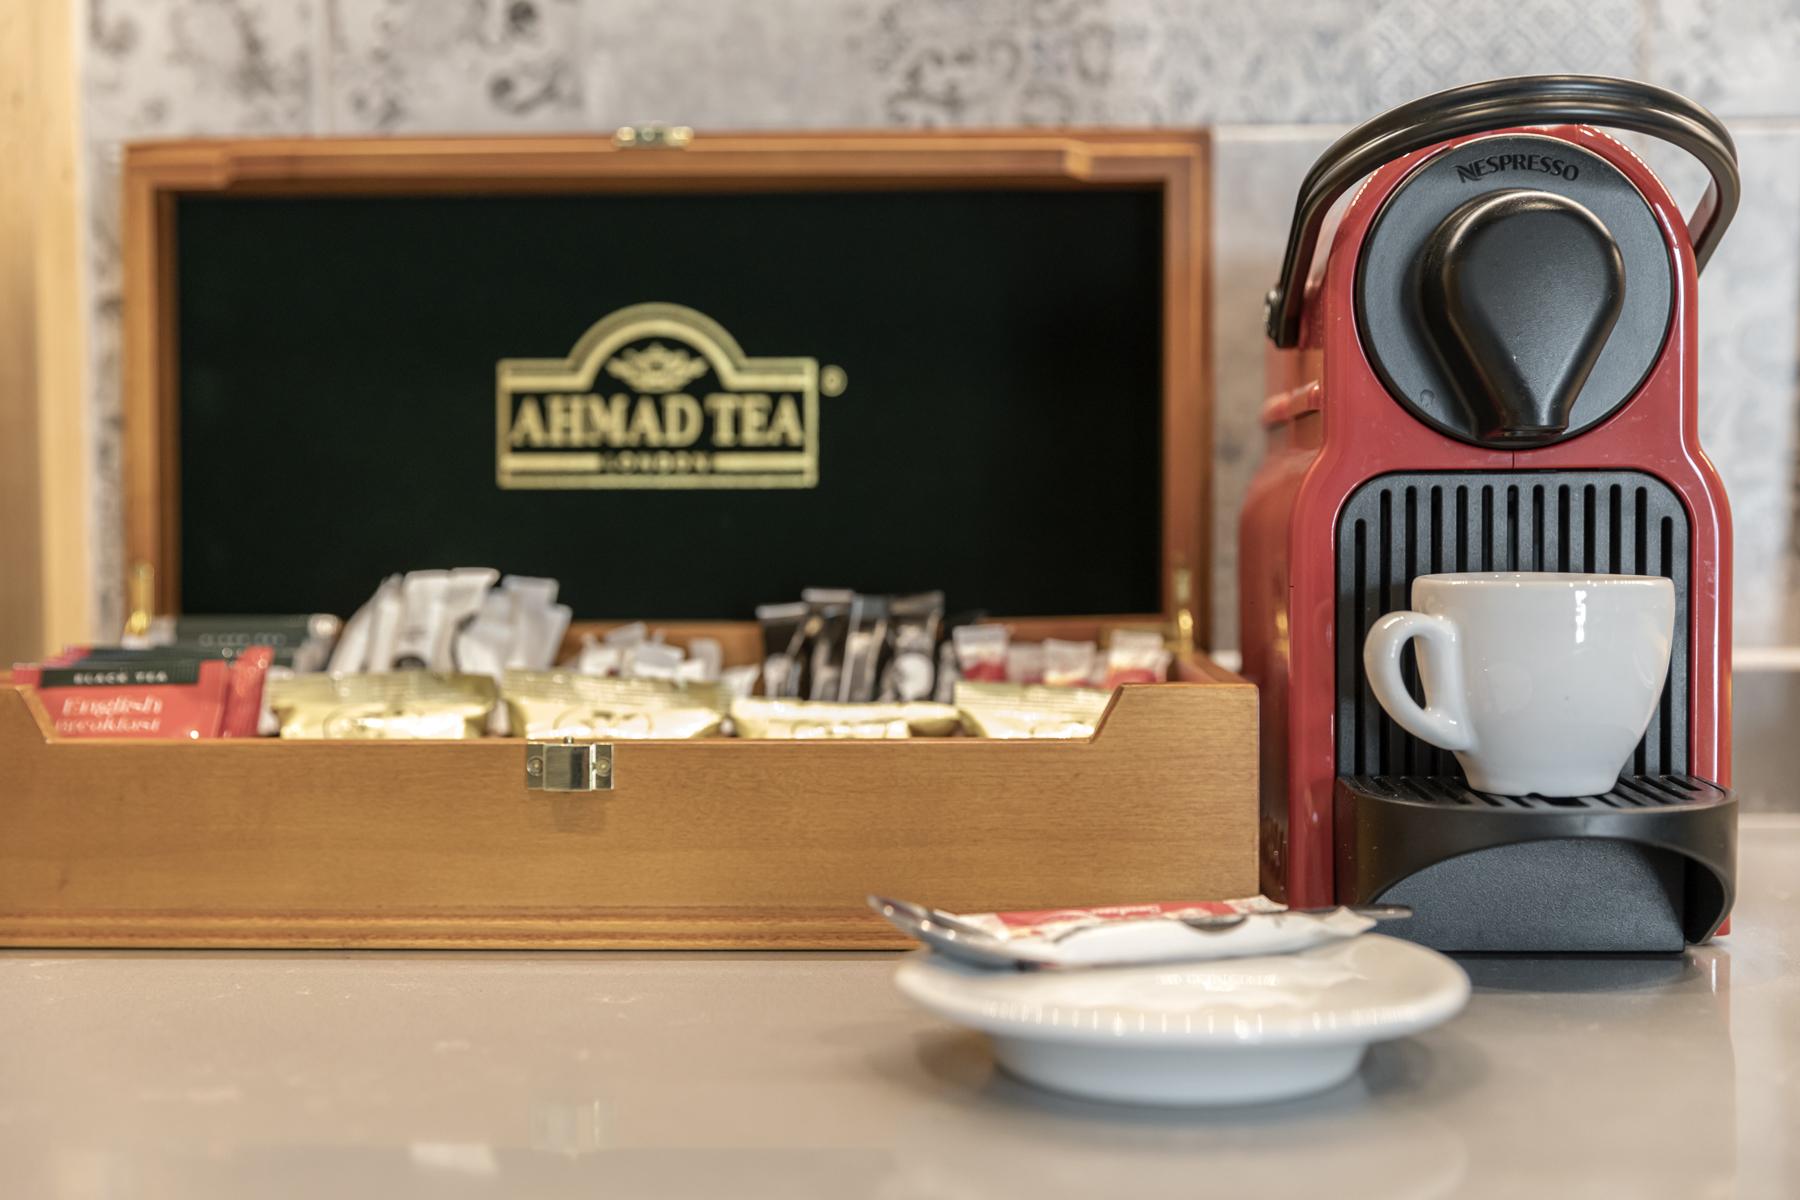 Alafropetra Luxury Suites - Coffee utensils